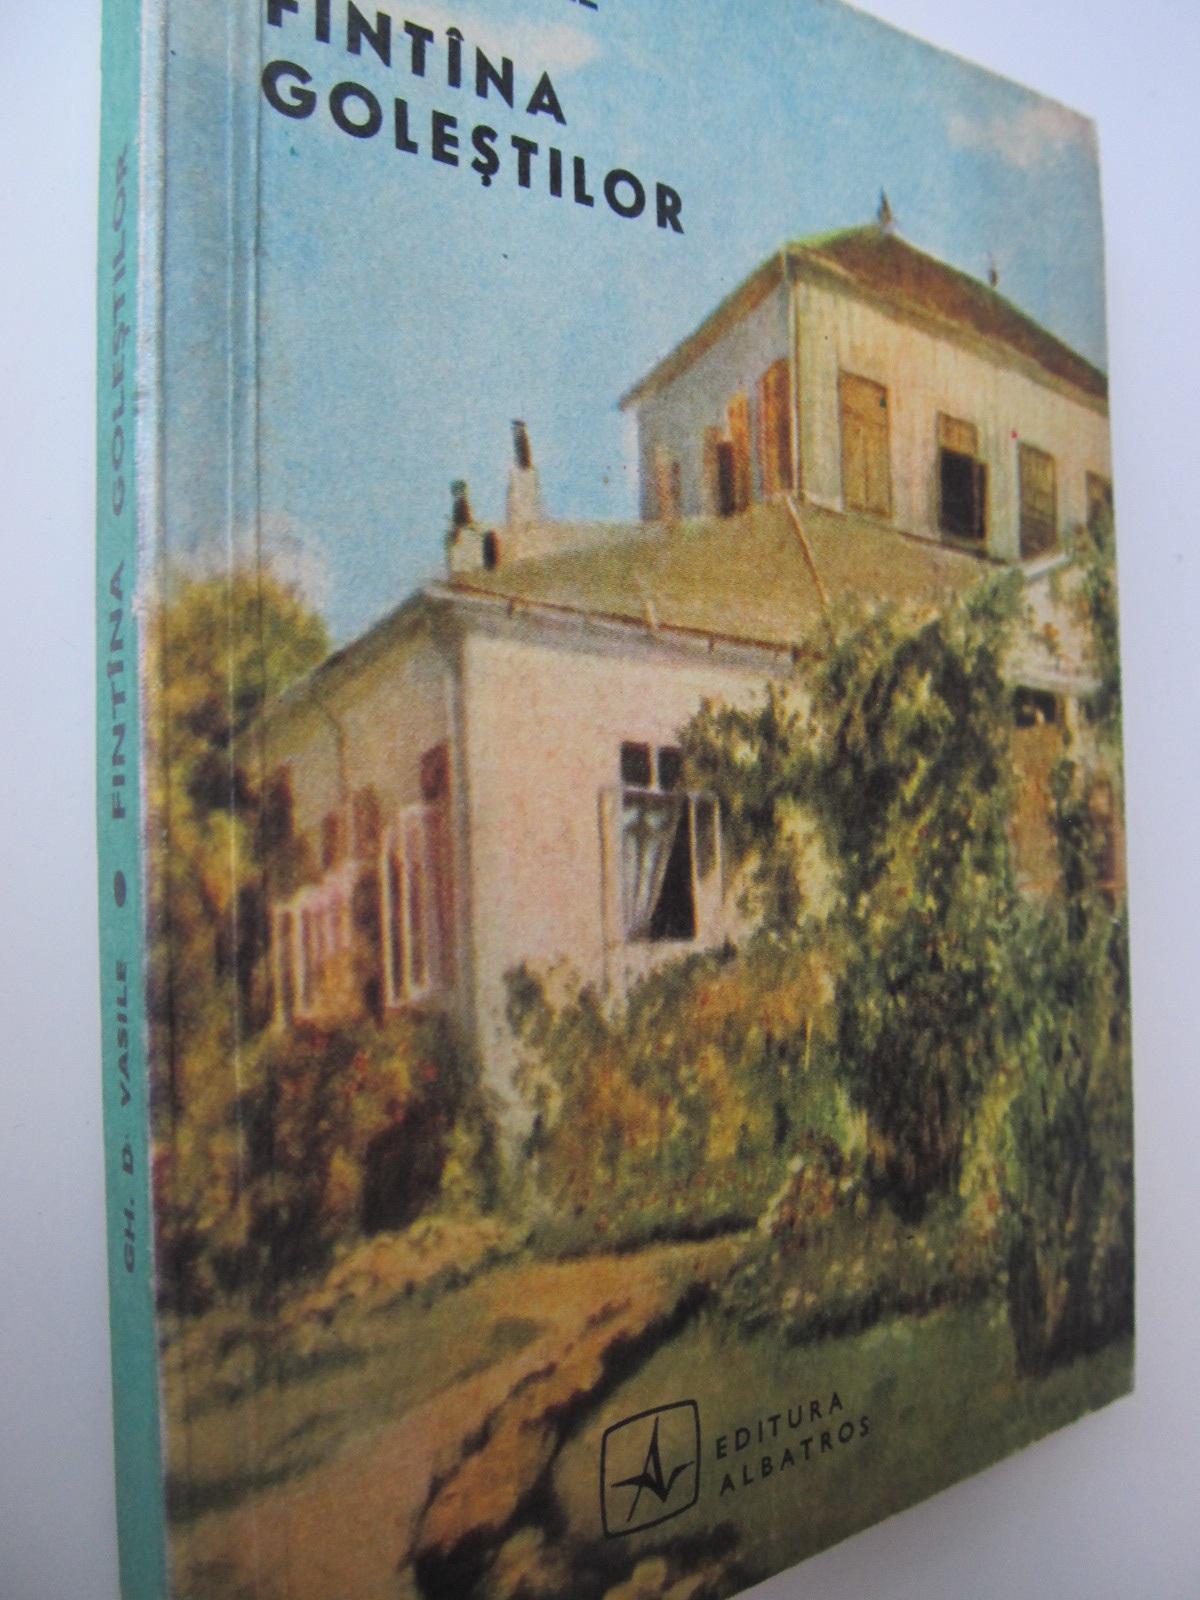 Fantana Golestilor - Gh. D. Vasile | Detalii carte